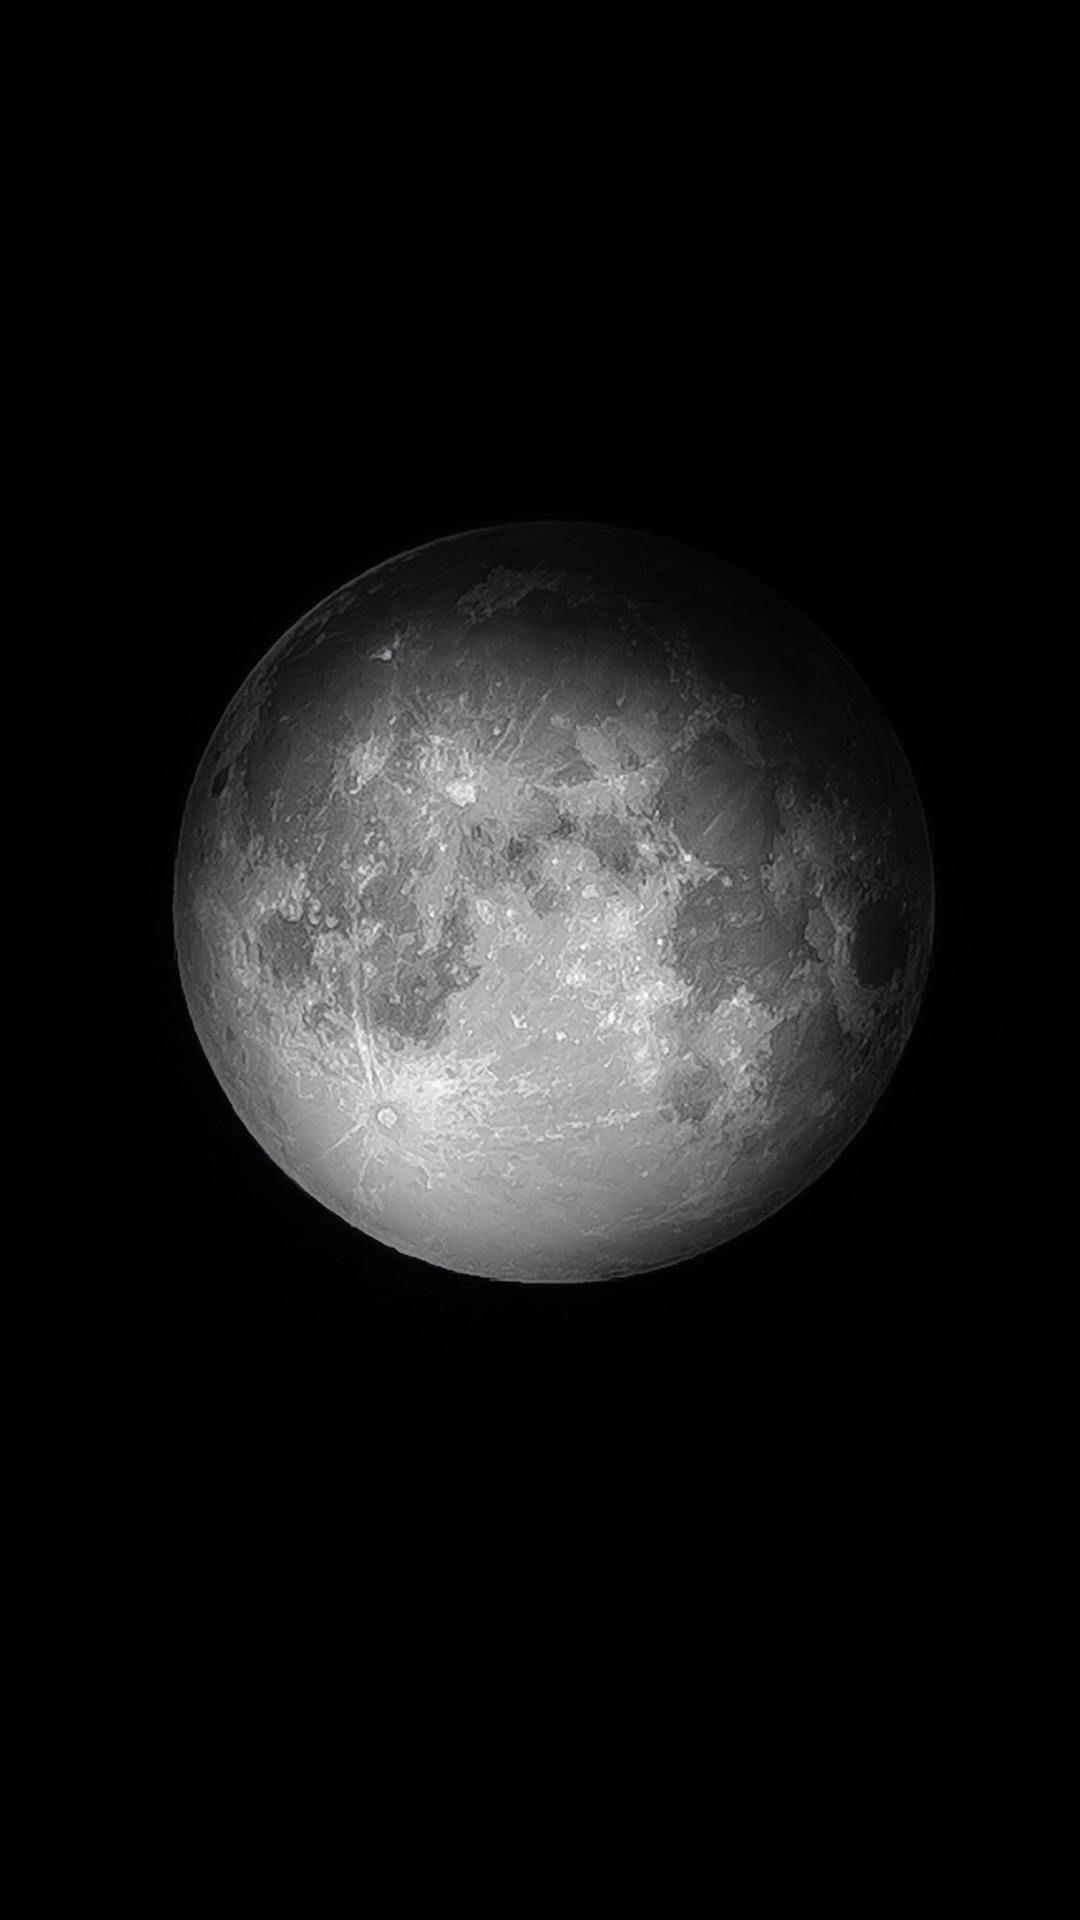 Full Moon 8k In 1080x1920 Resolution Full Moon Moon Moon Art